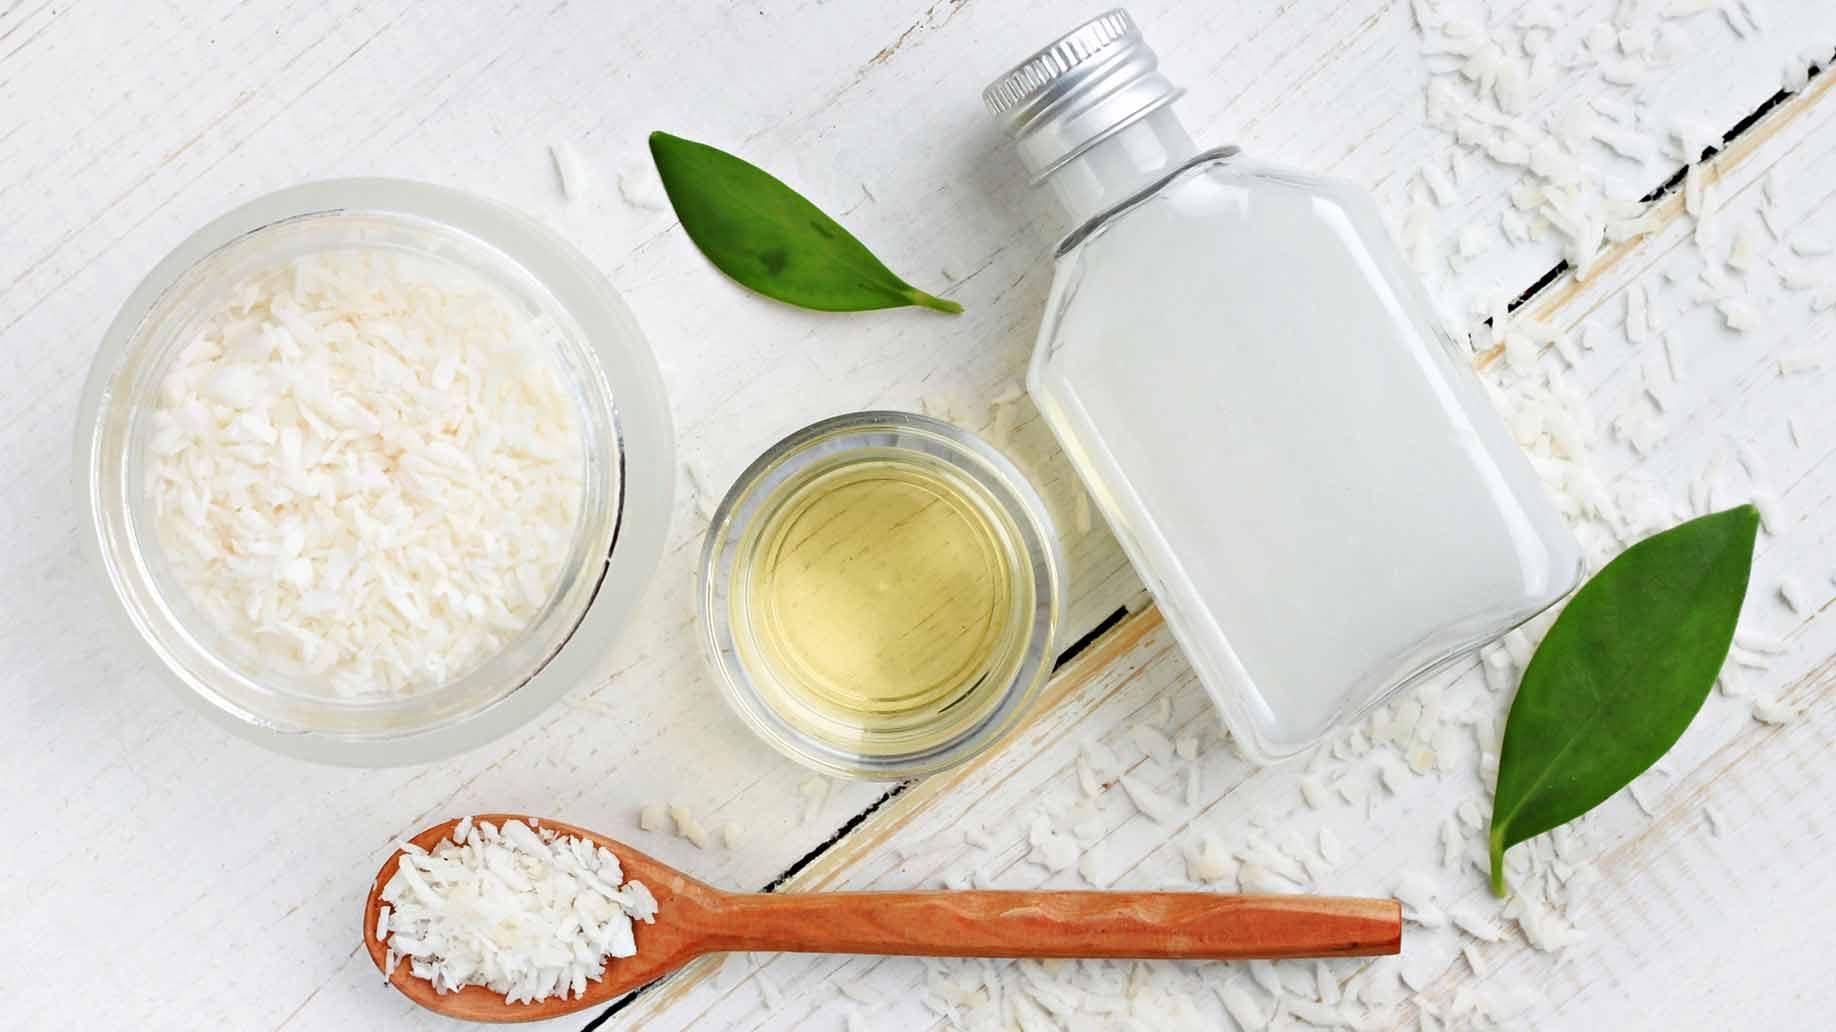 natural homemade shampoo ingredients diy toxins chemical free